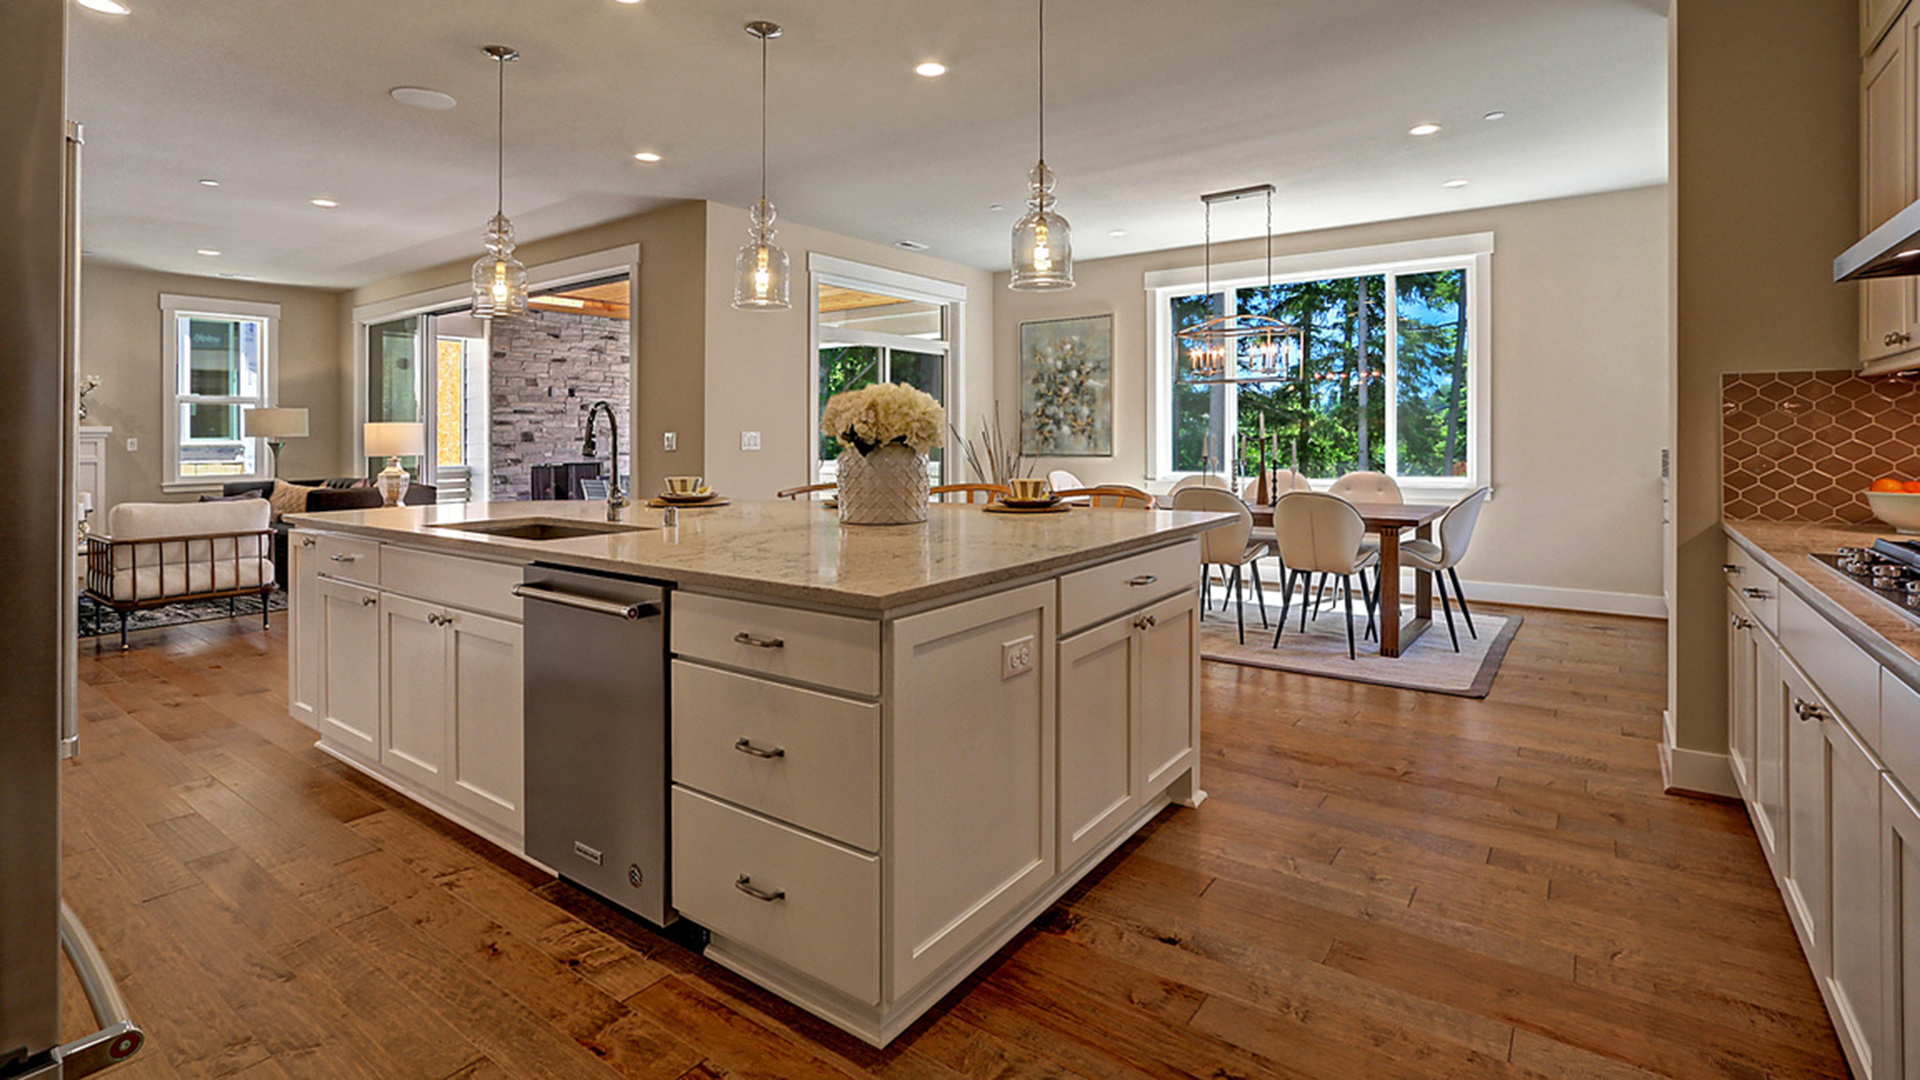 New Luxury Homes For Sale in Kirkland, WA   Kirkland Crest